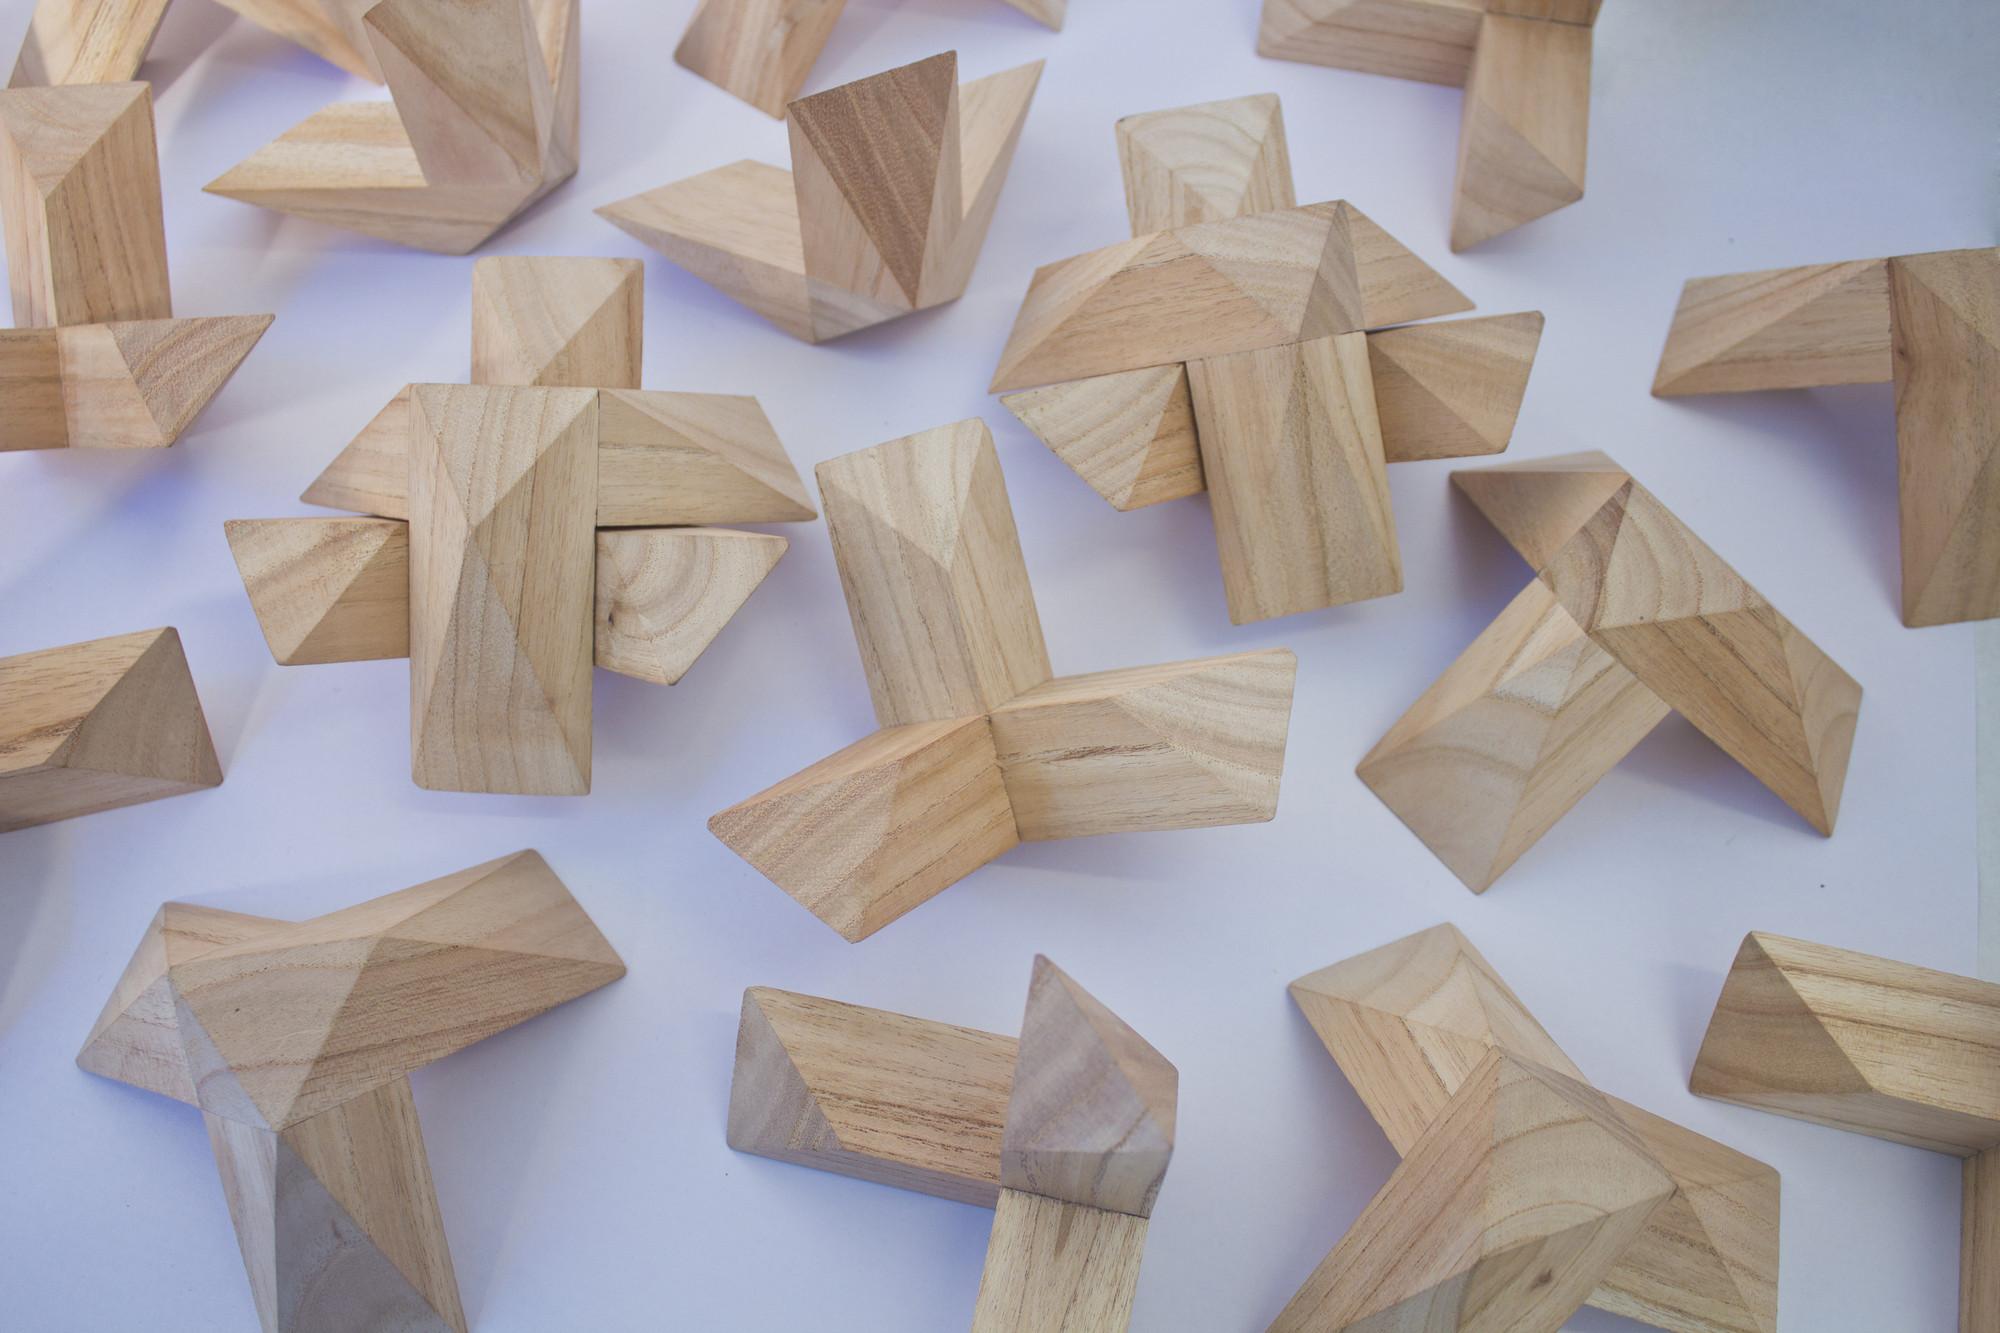 Sobremesa, una muestra de diseño trasandino (Argentino-Chileno), Gonzalo Arbutti. Triada 2. Image Courtesy of Estudio Normal™